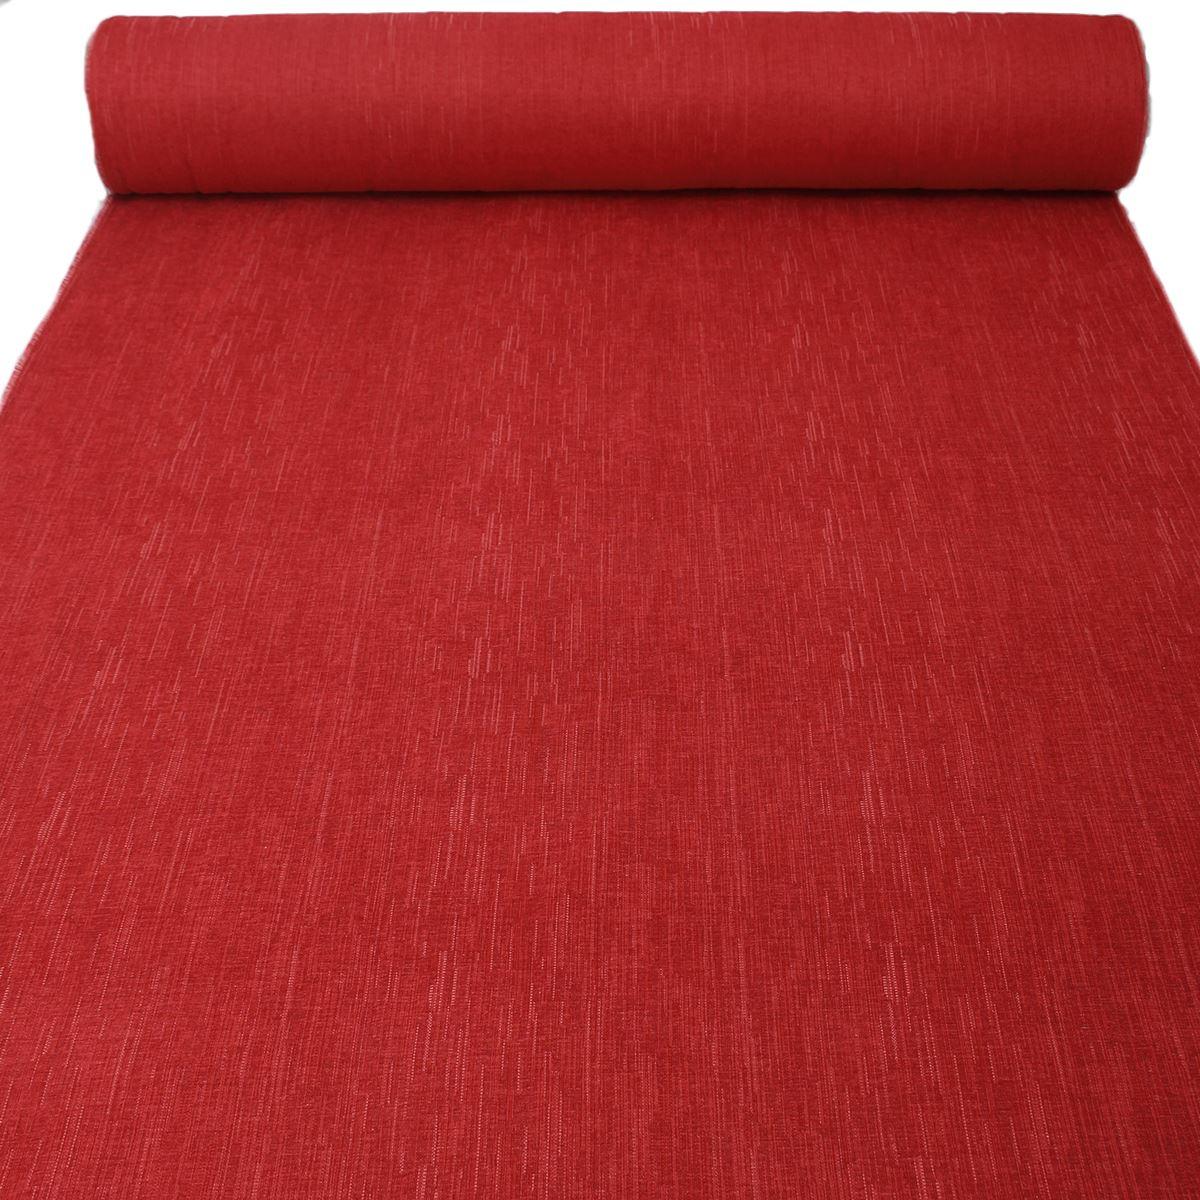 034-Chenille-034-Slubbed-Shabby-Worn-Look-Curtain-Cushion-Sofa-Upholstery-Fabric thumbnail 68